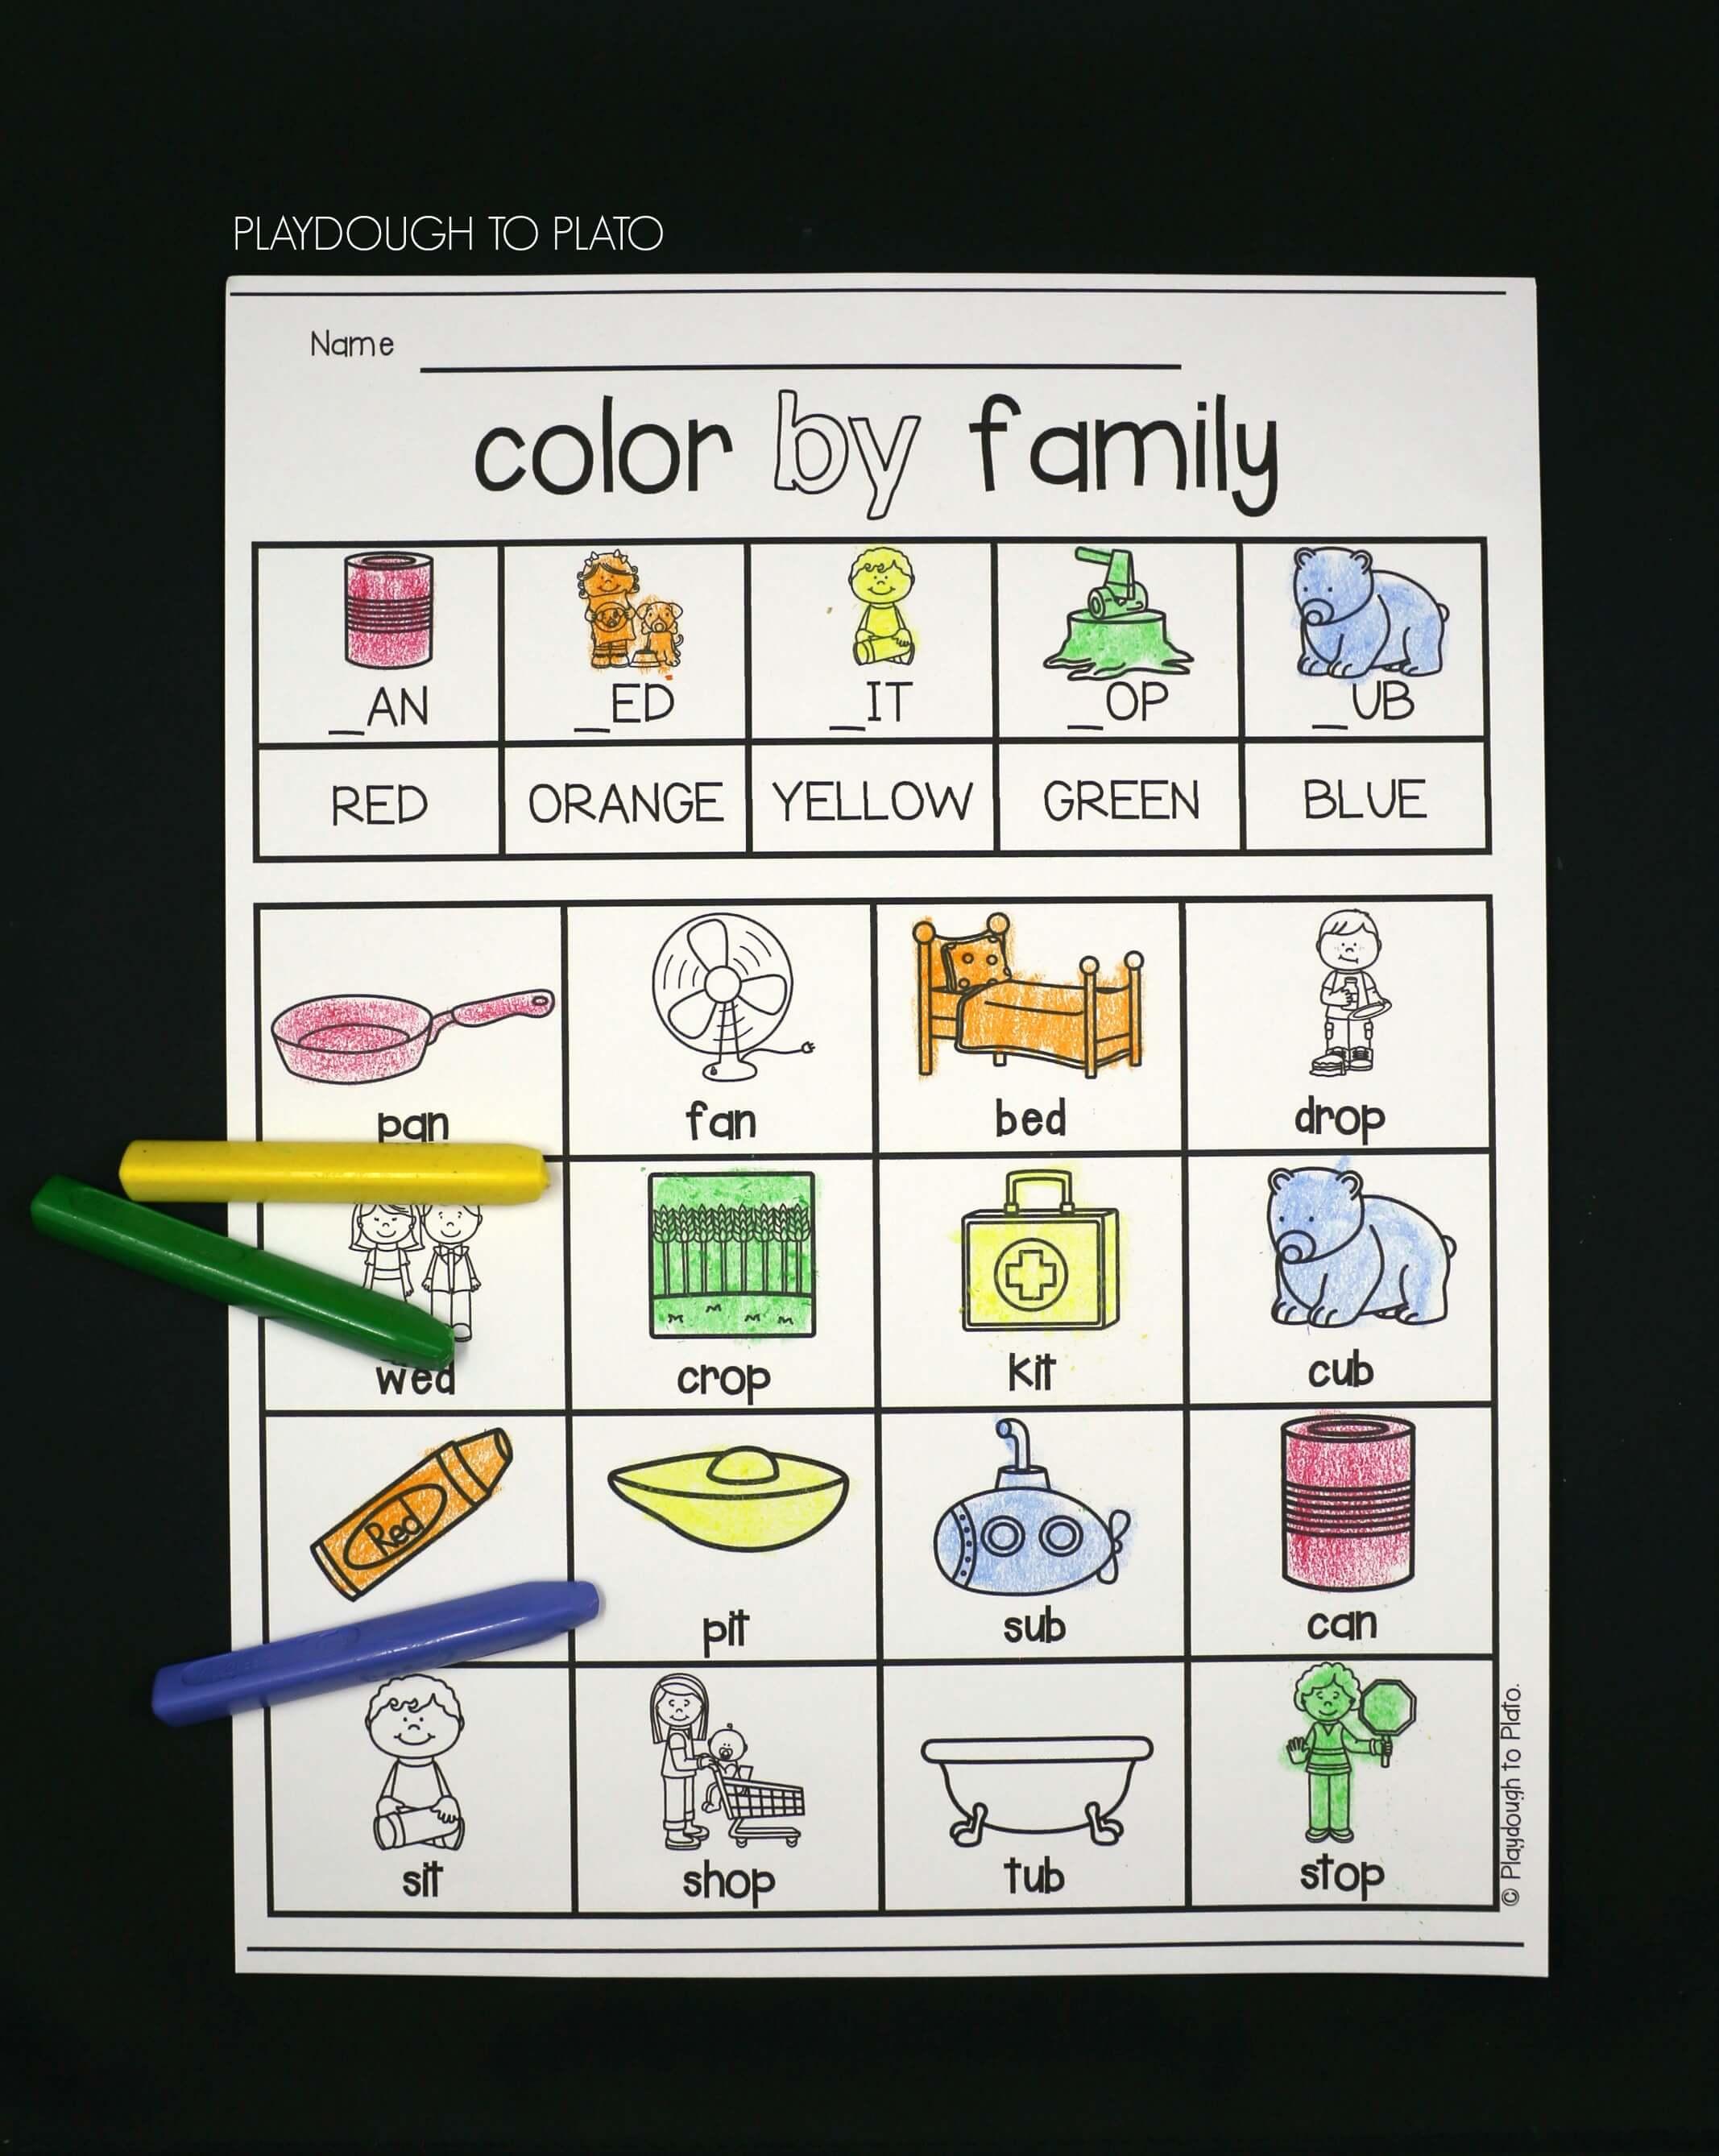 Word Family Activity Pack - Playdough To Plato